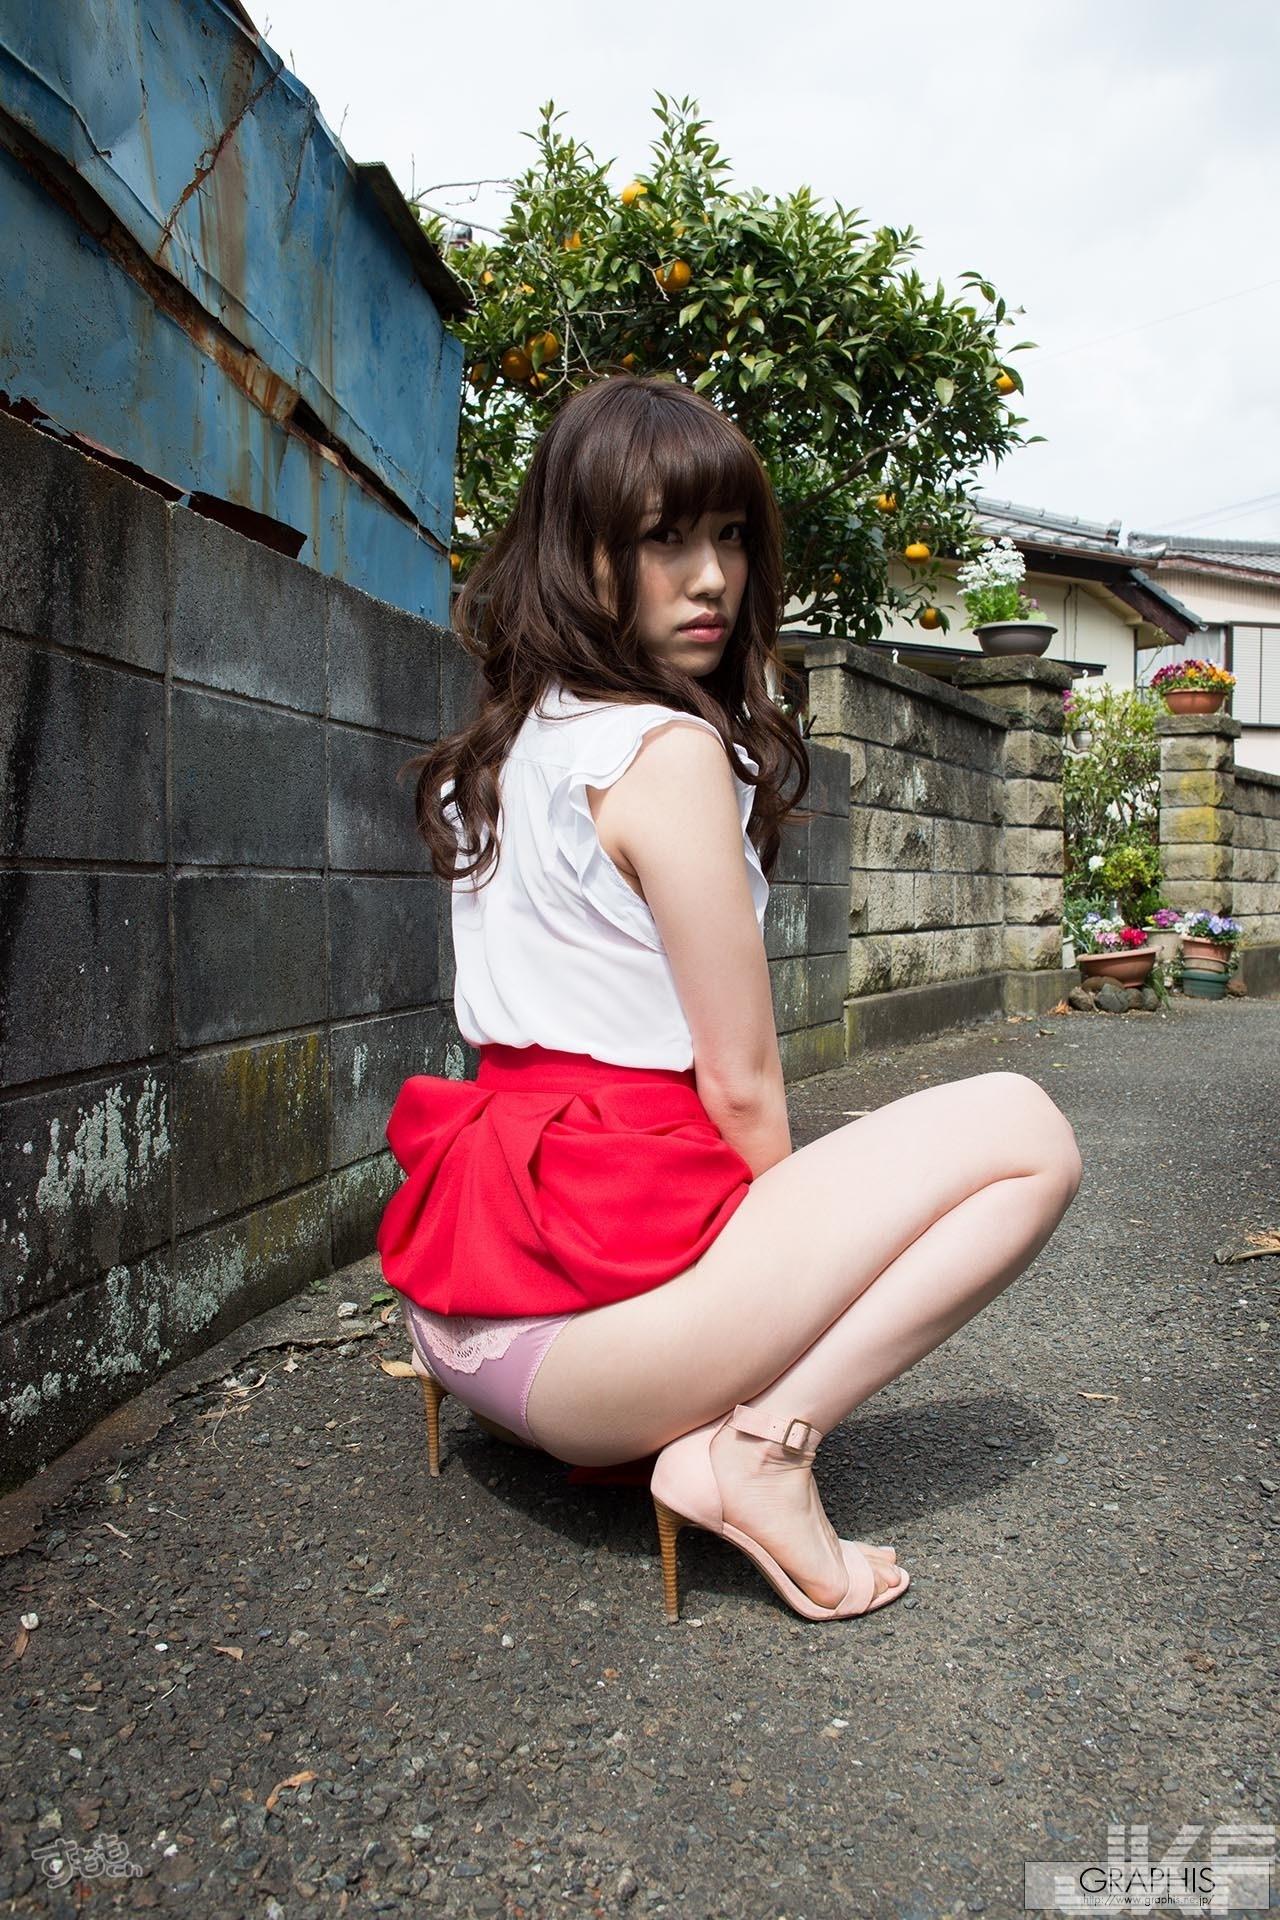 ichikawa_masami_5017-035.jpg